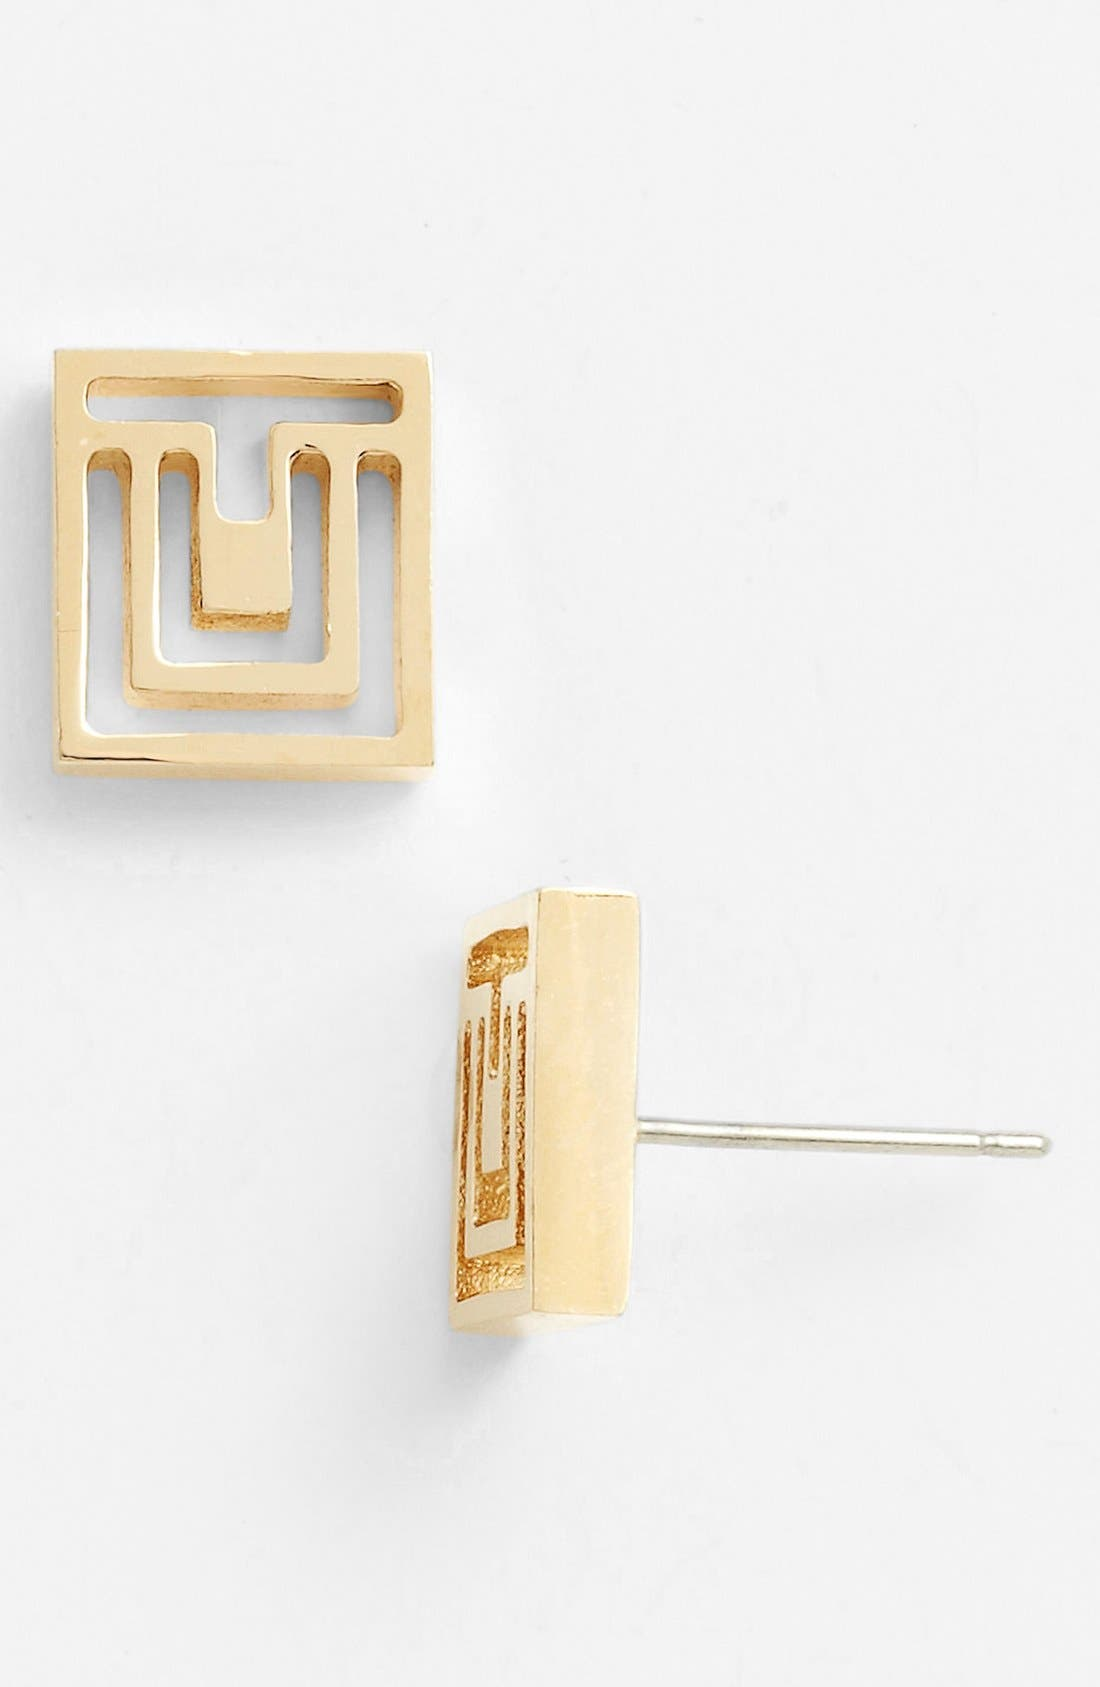 Main Image - Tory Burch 'Frete' Stud Earrings